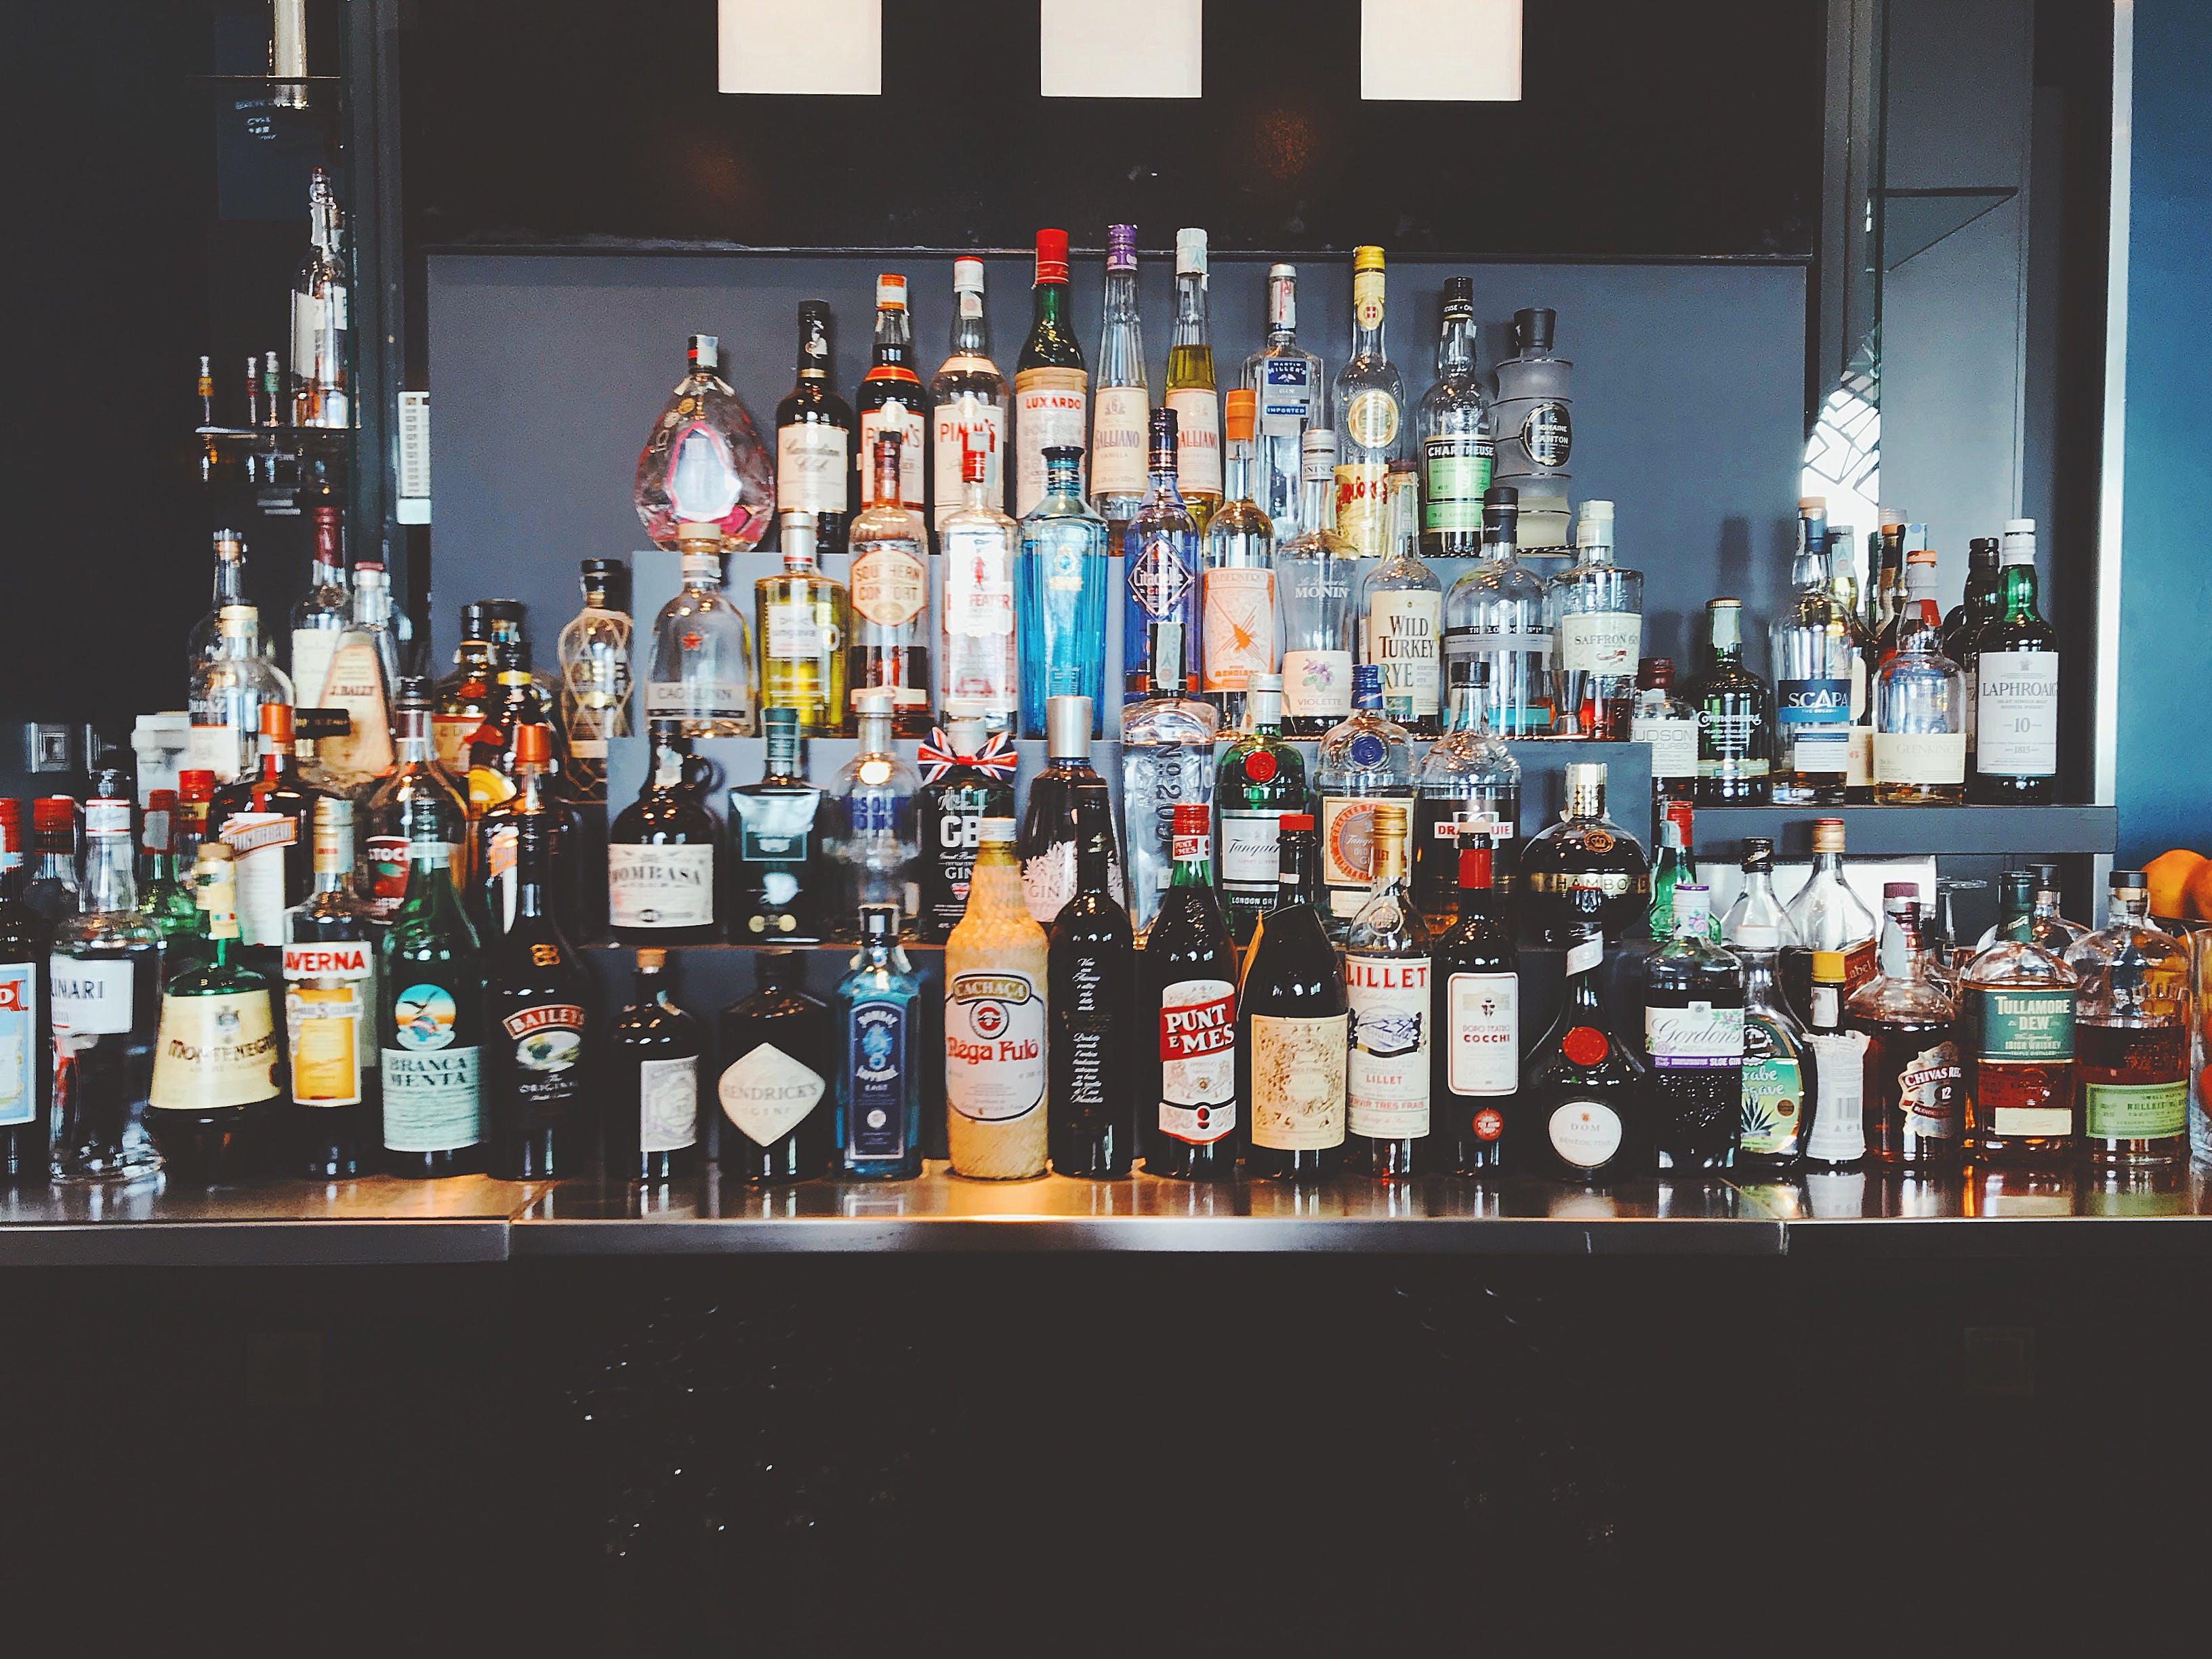 Kostenloses Stock Foto zu alkohol, alkoholisches getränk, bar, bier